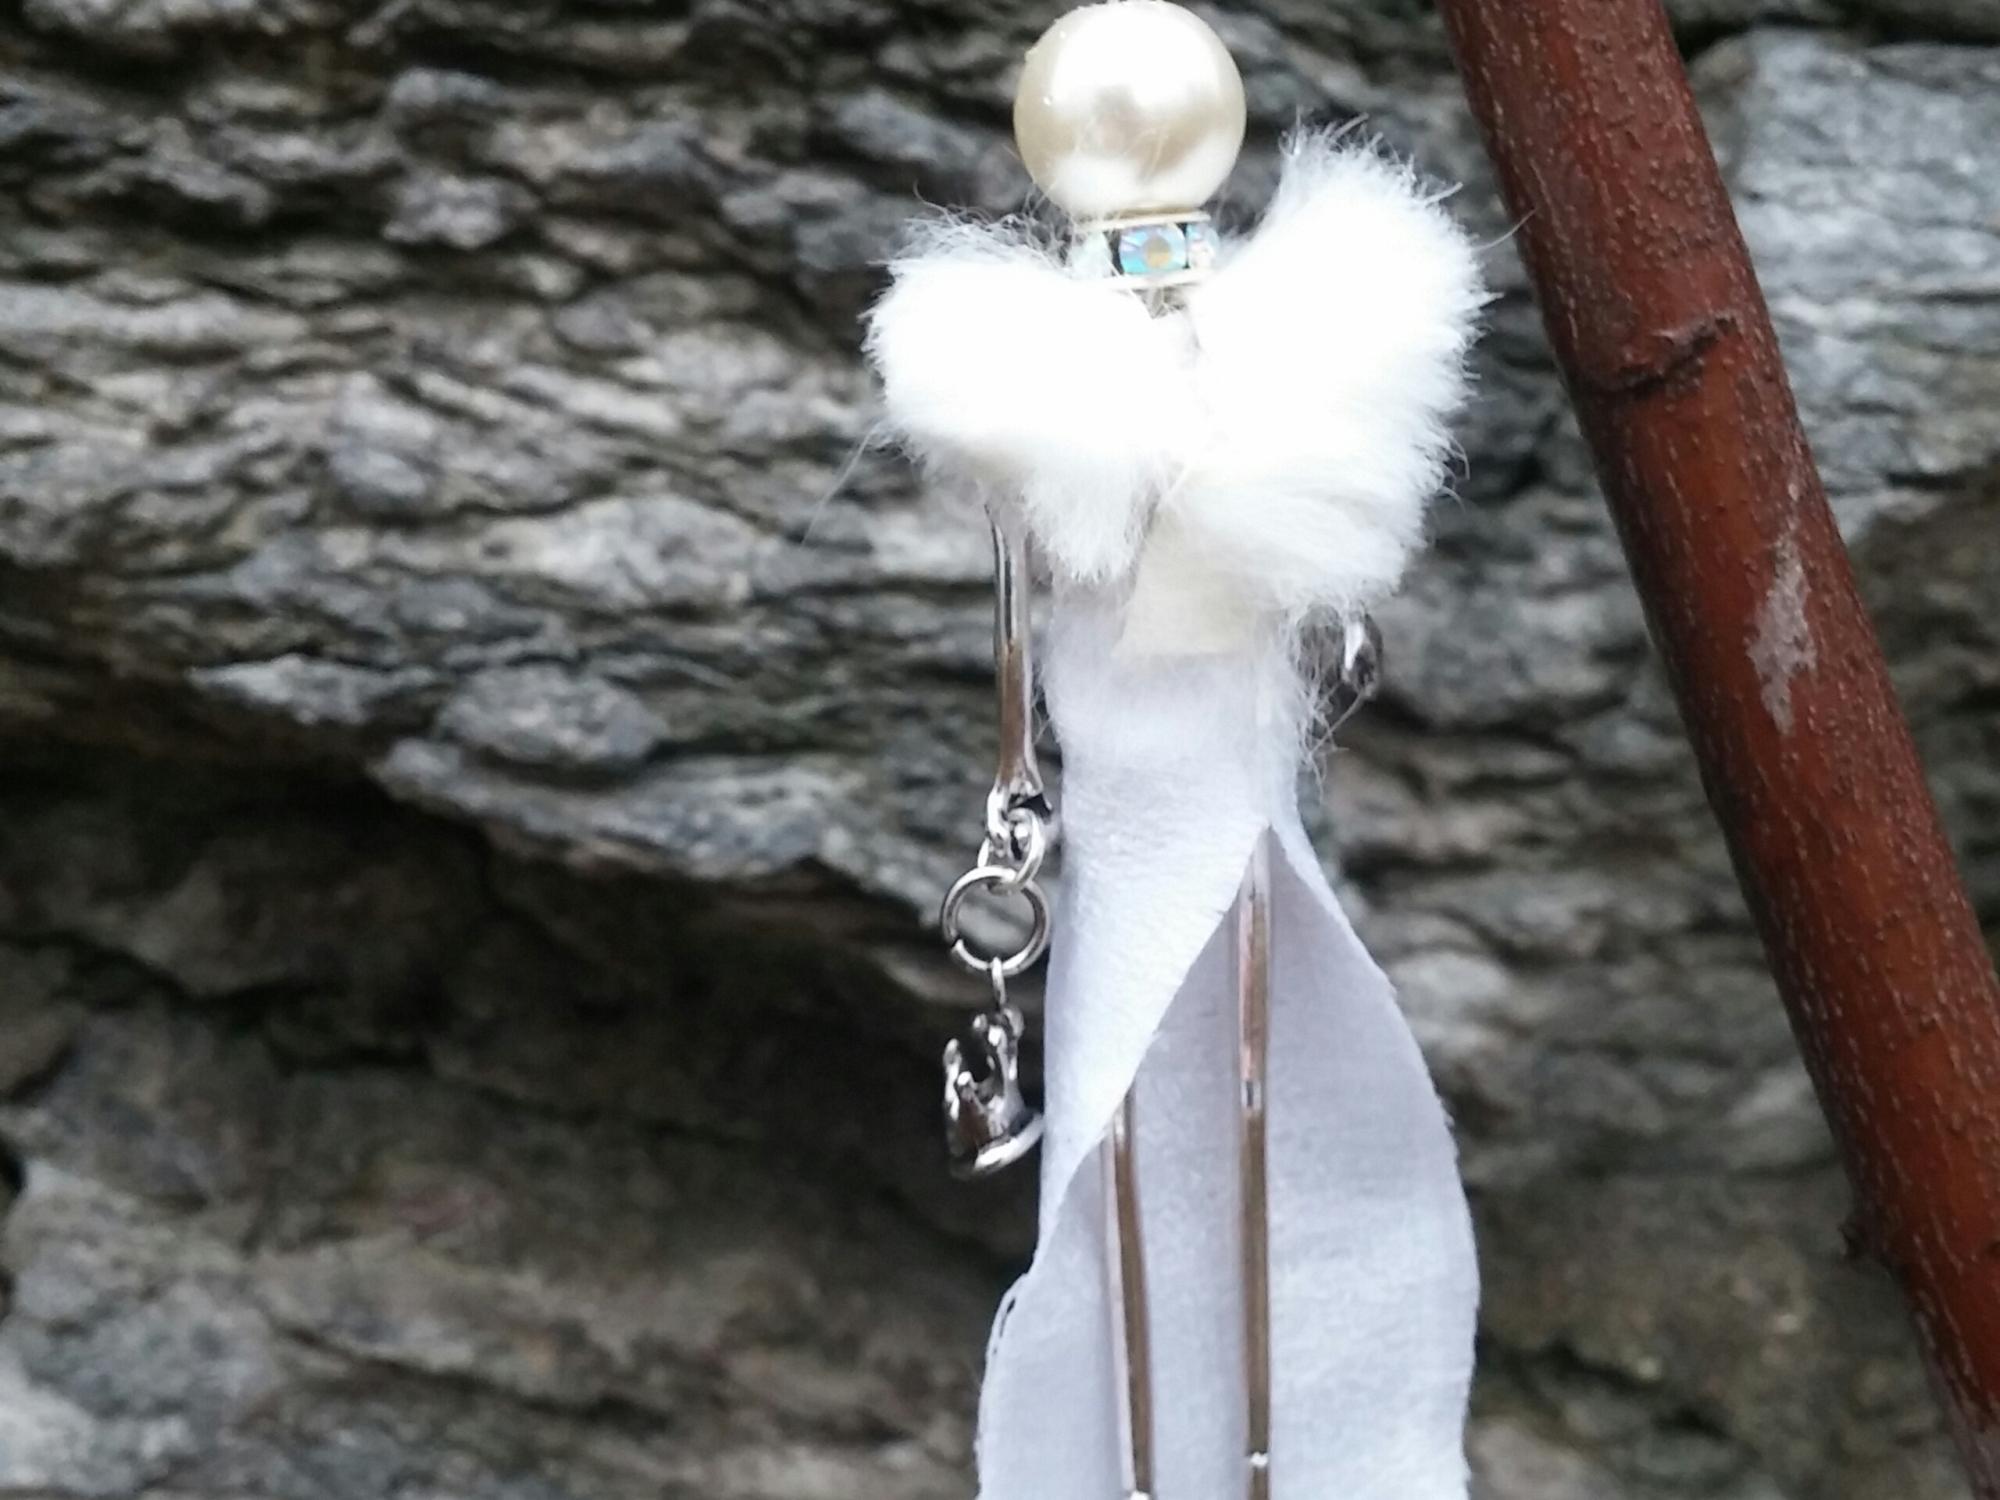 Doll, Christmas Doll, Snow Doll, Winter Doll, Ice Doll, Winter Princess, Snow Princess, Ice Princess, Christmas Ornament, Tree Ornament